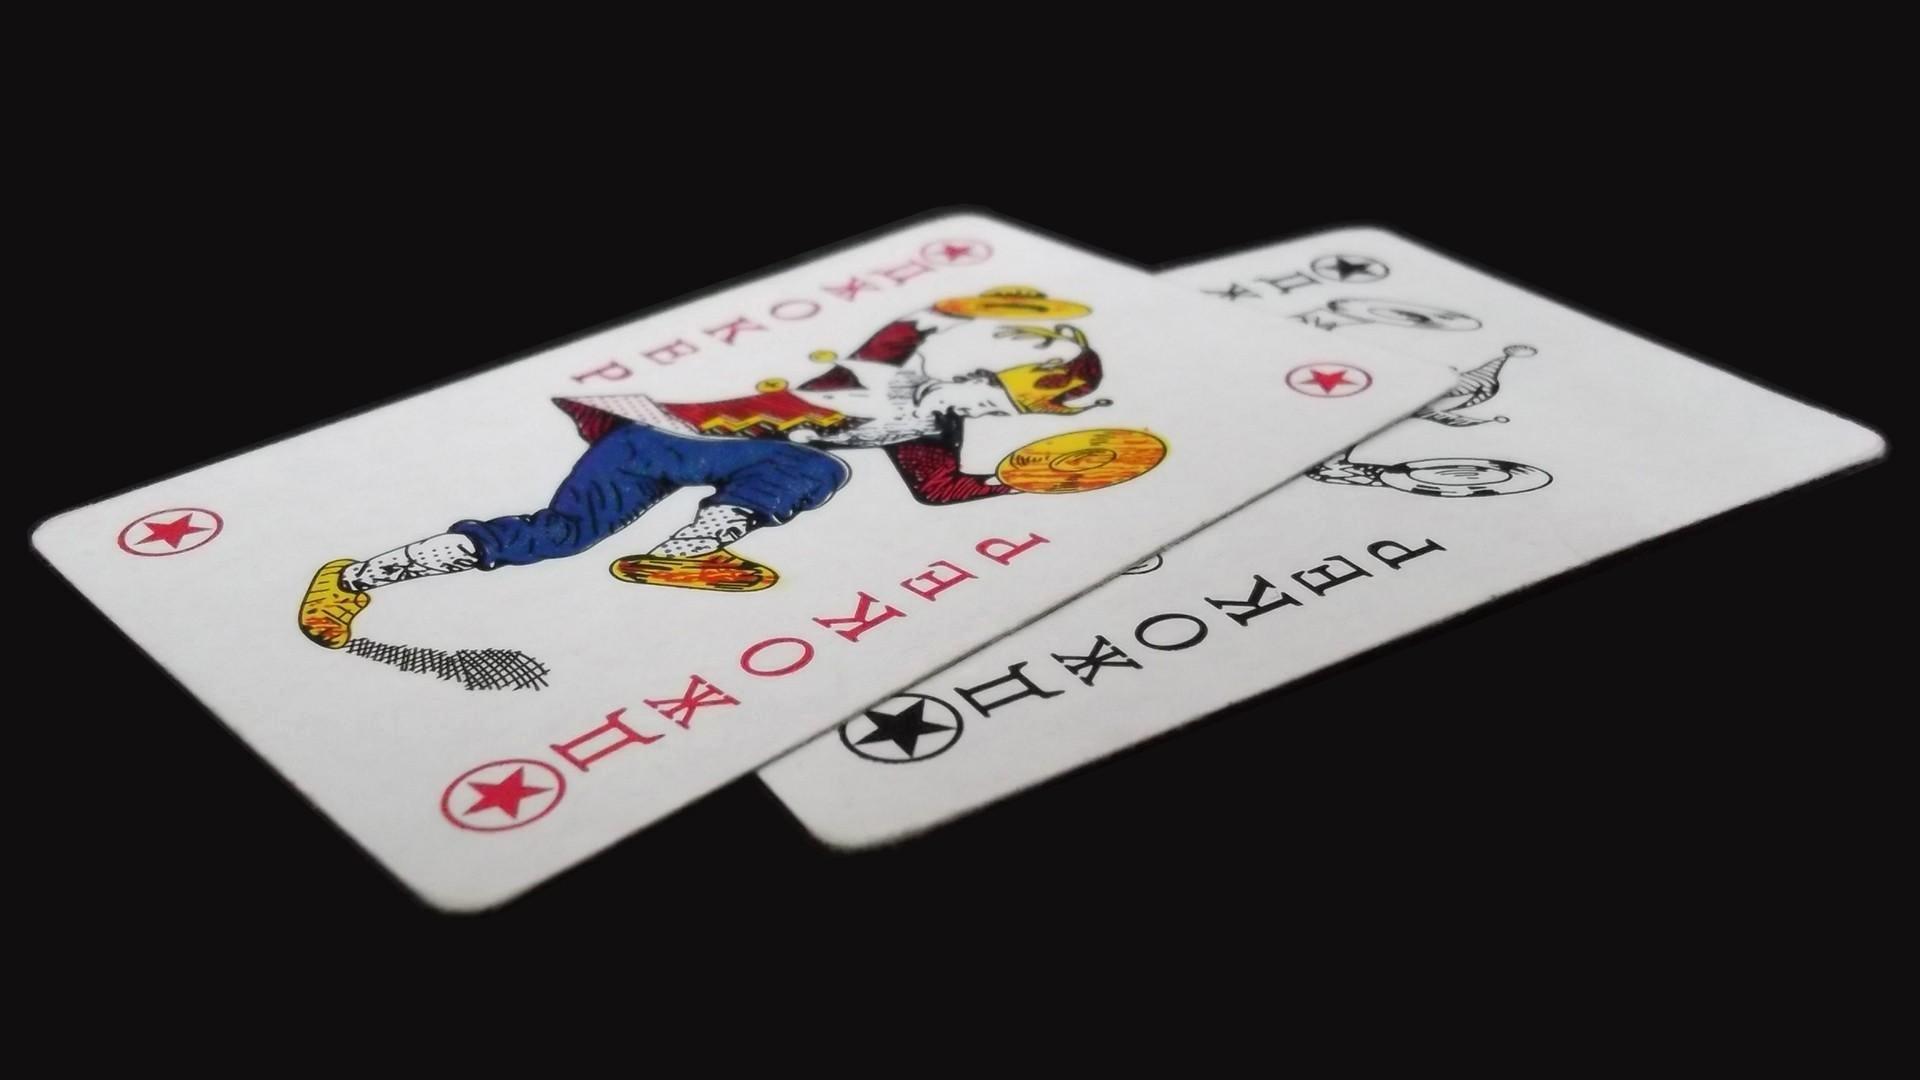 Playing Cards Wallpaper Wallpapersafari